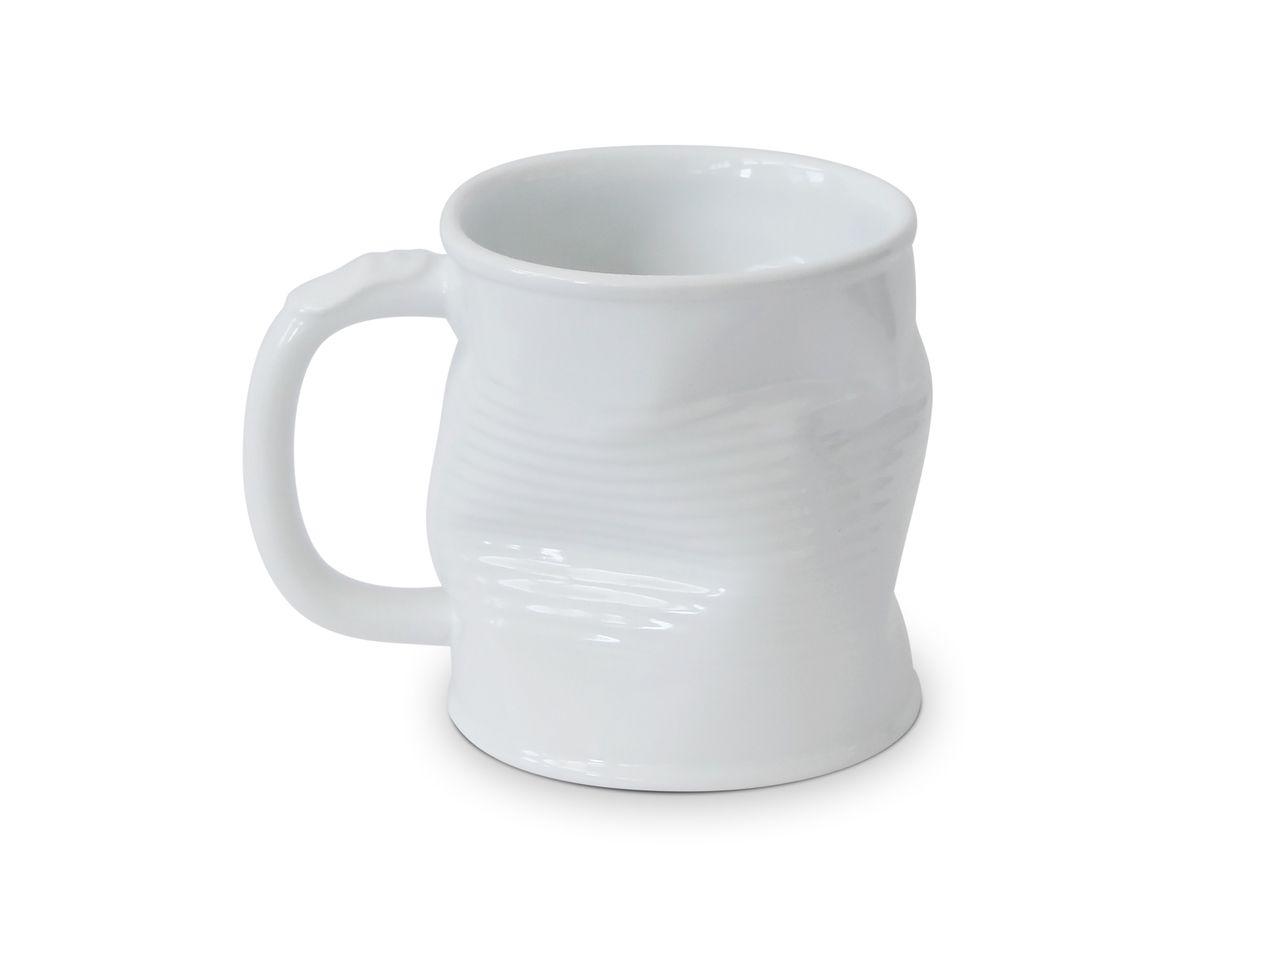 Caneca De Cerâmica Lata Amassada 320Ml - Branco Mondoceram